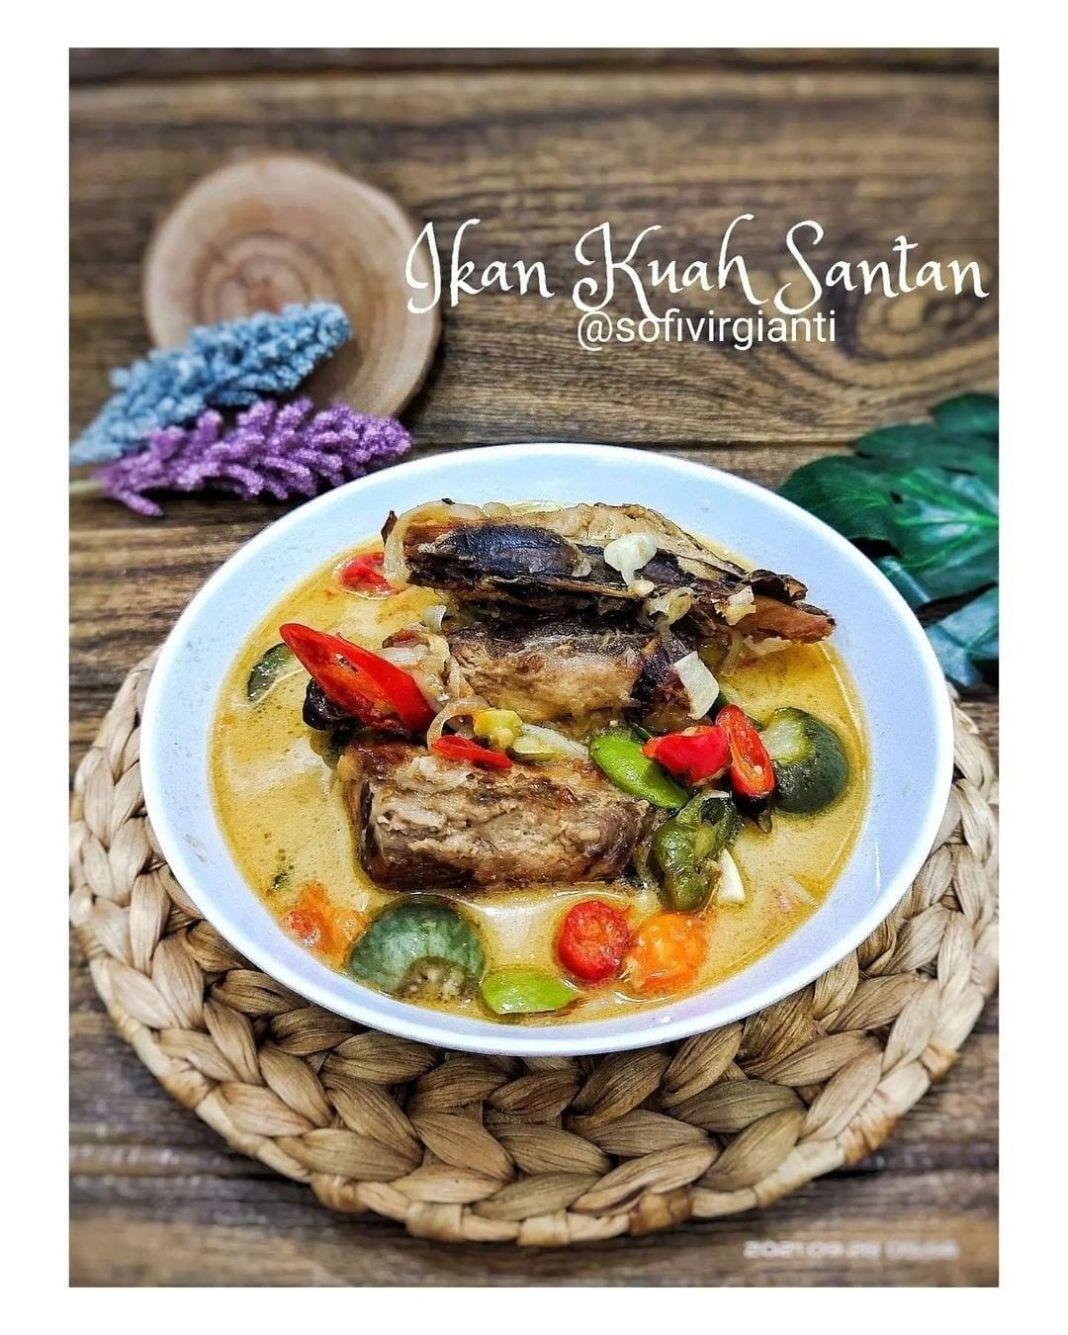 Info kuliner, kalo di pedesin rasanya duhh enak banget loh  Ikan Asap Masak Santan @sofivirgianti  Bahan :  5…